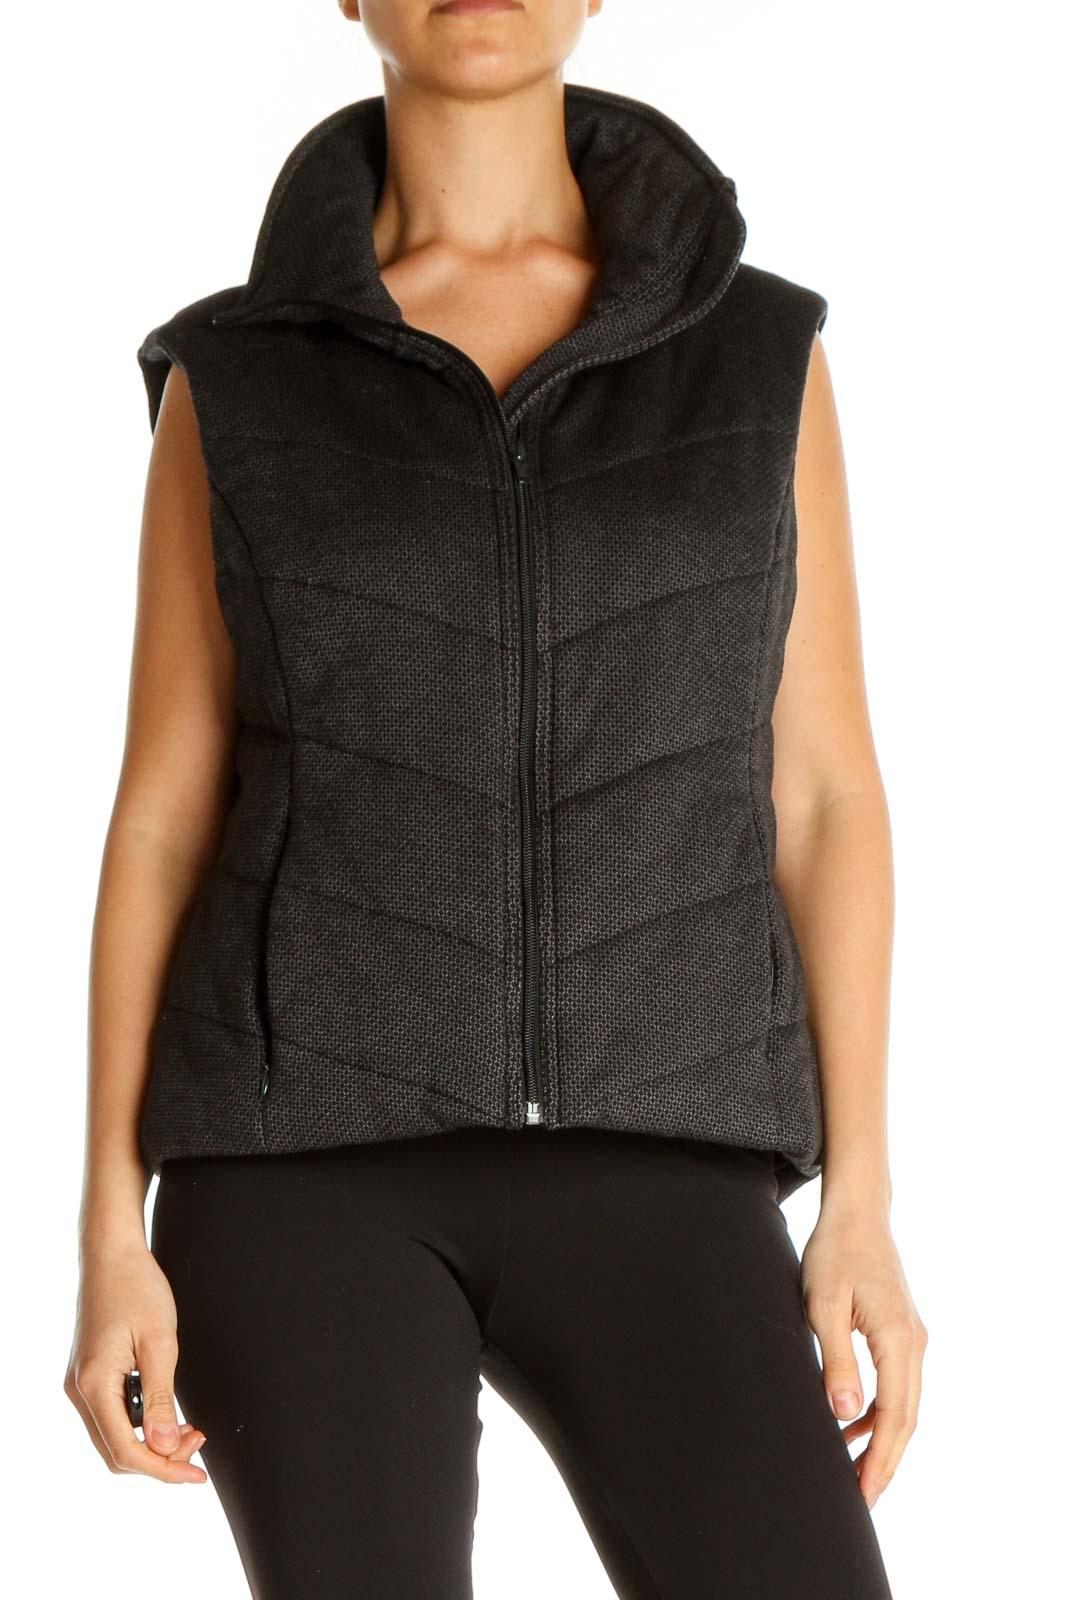 Gray Vest Jacket Front